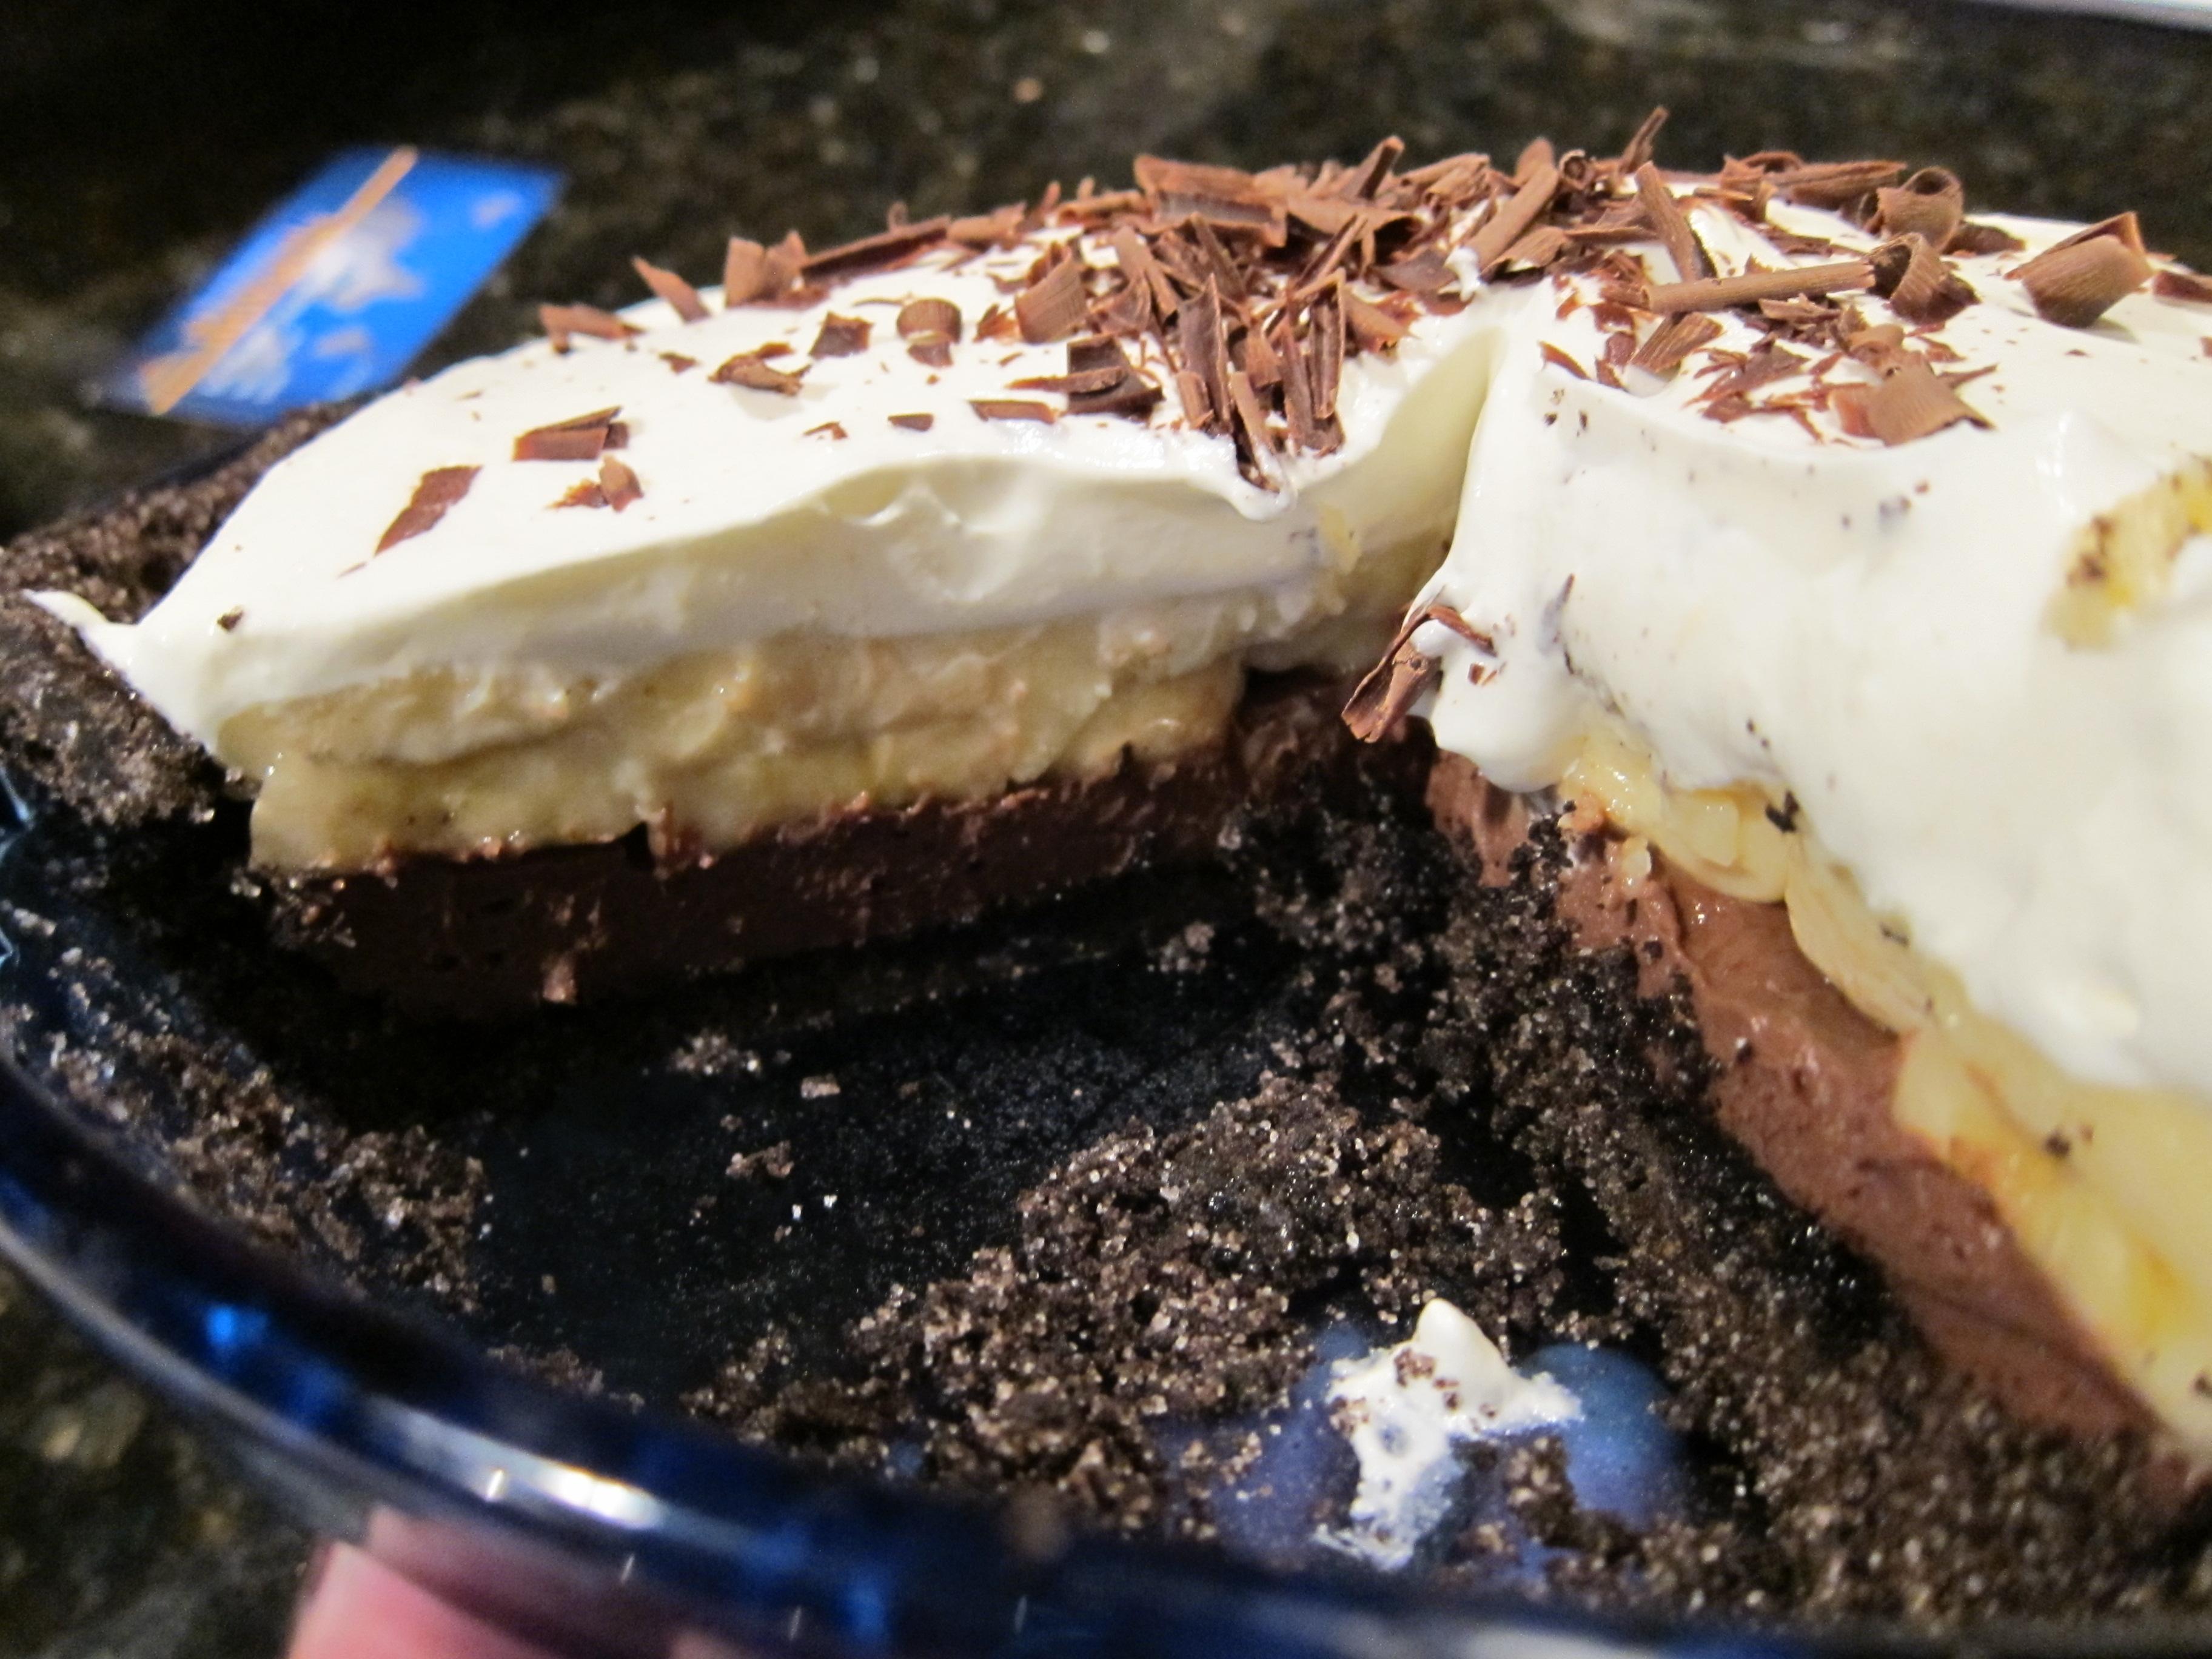 banana cream pie recipe | Dinner With Weijia